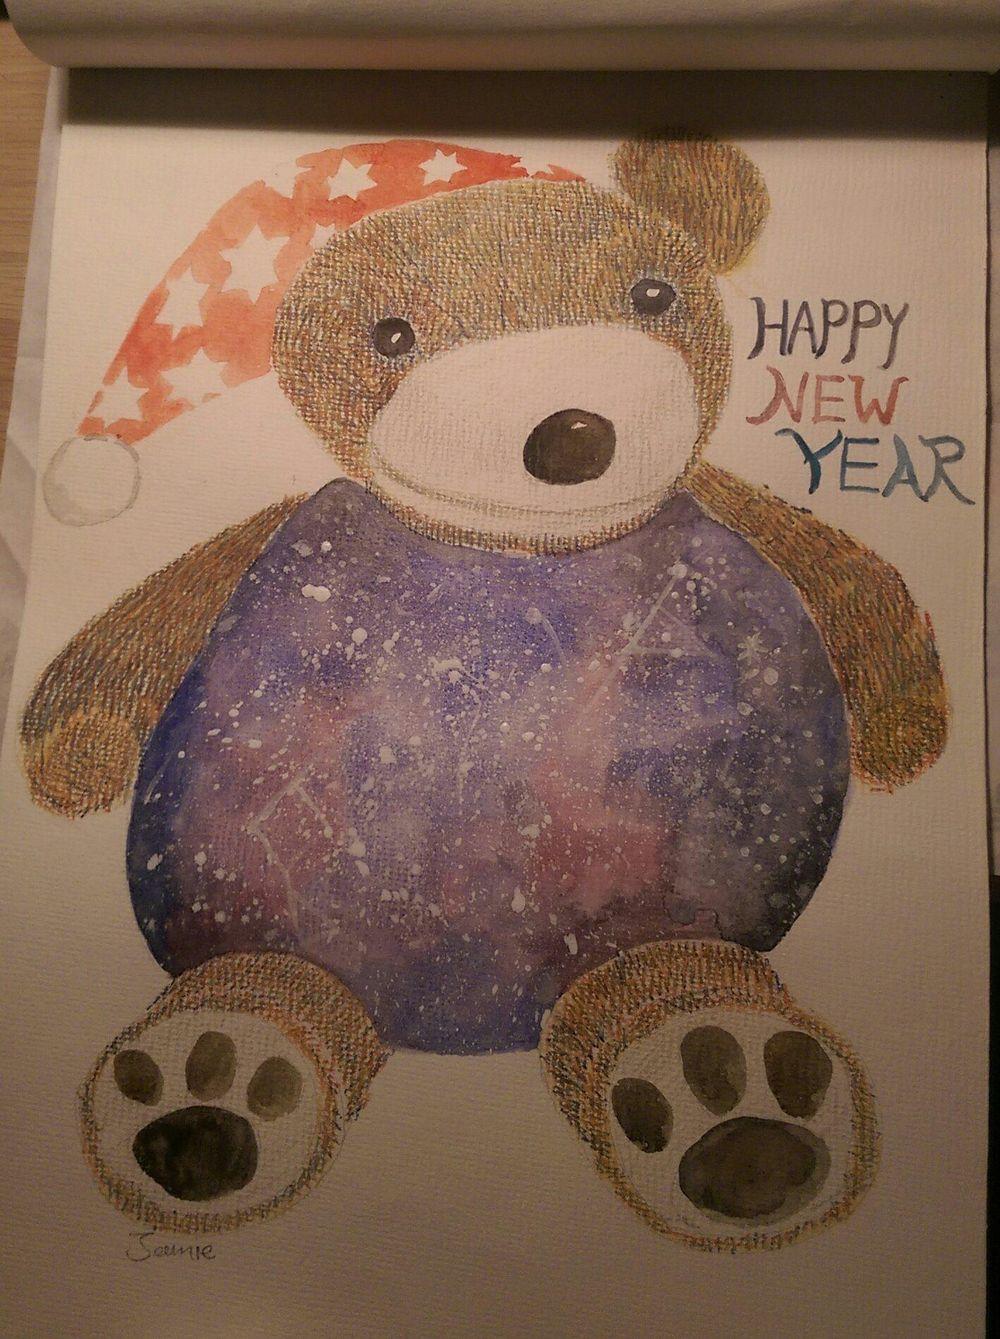 galaxy bear - image 1 - student project